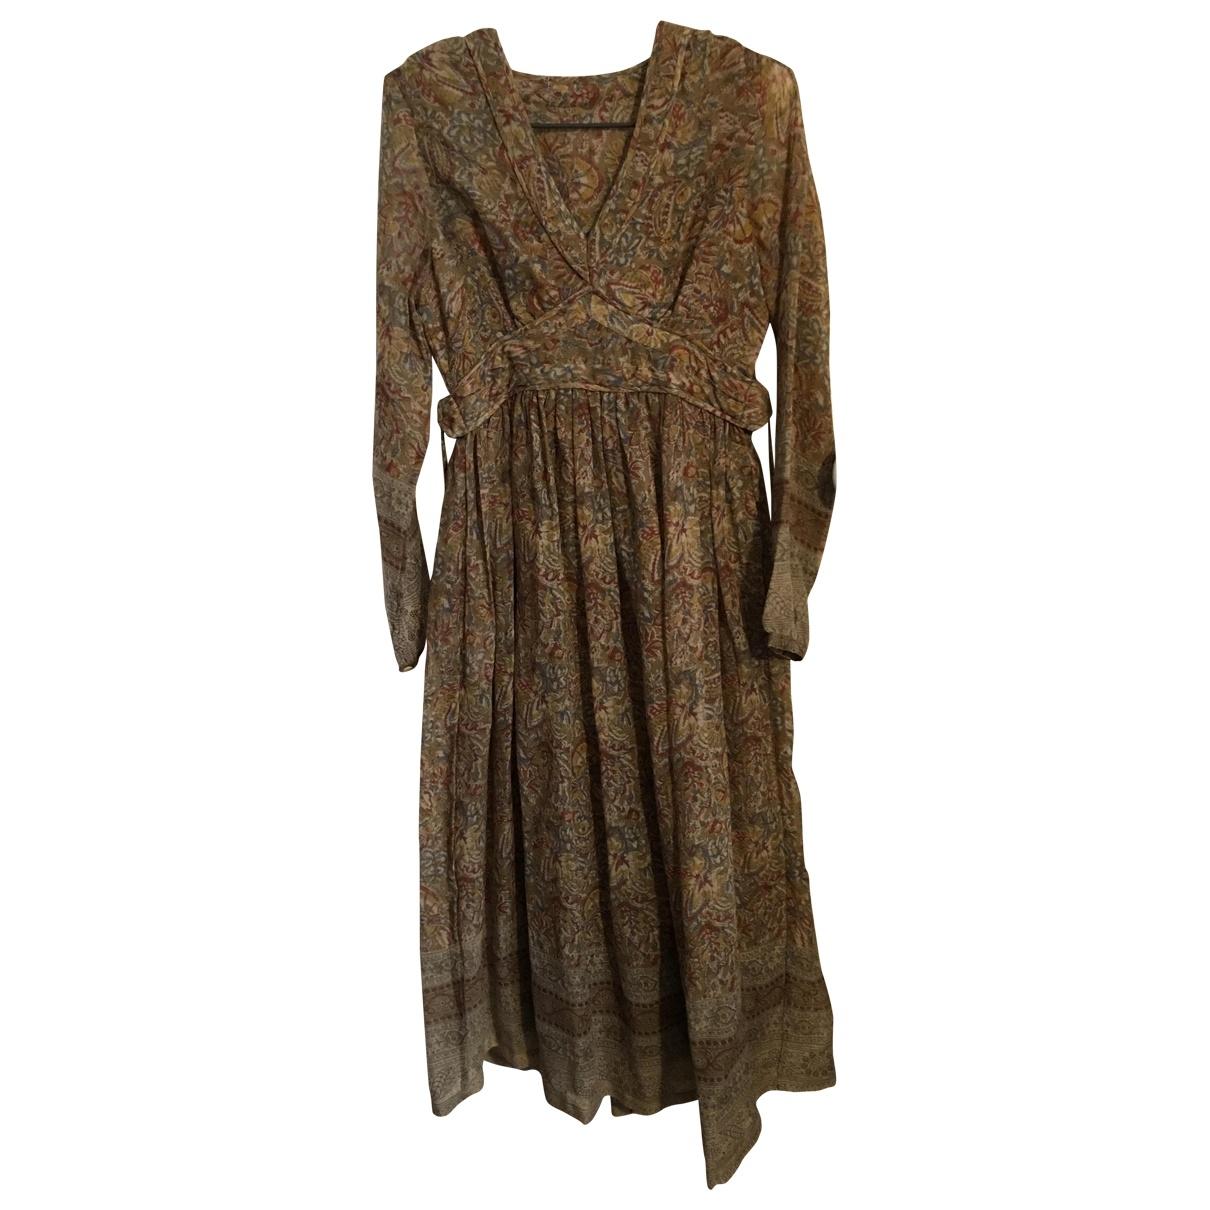 Laurence Dolige \N Multicolour Wool dress for Women 36 FR